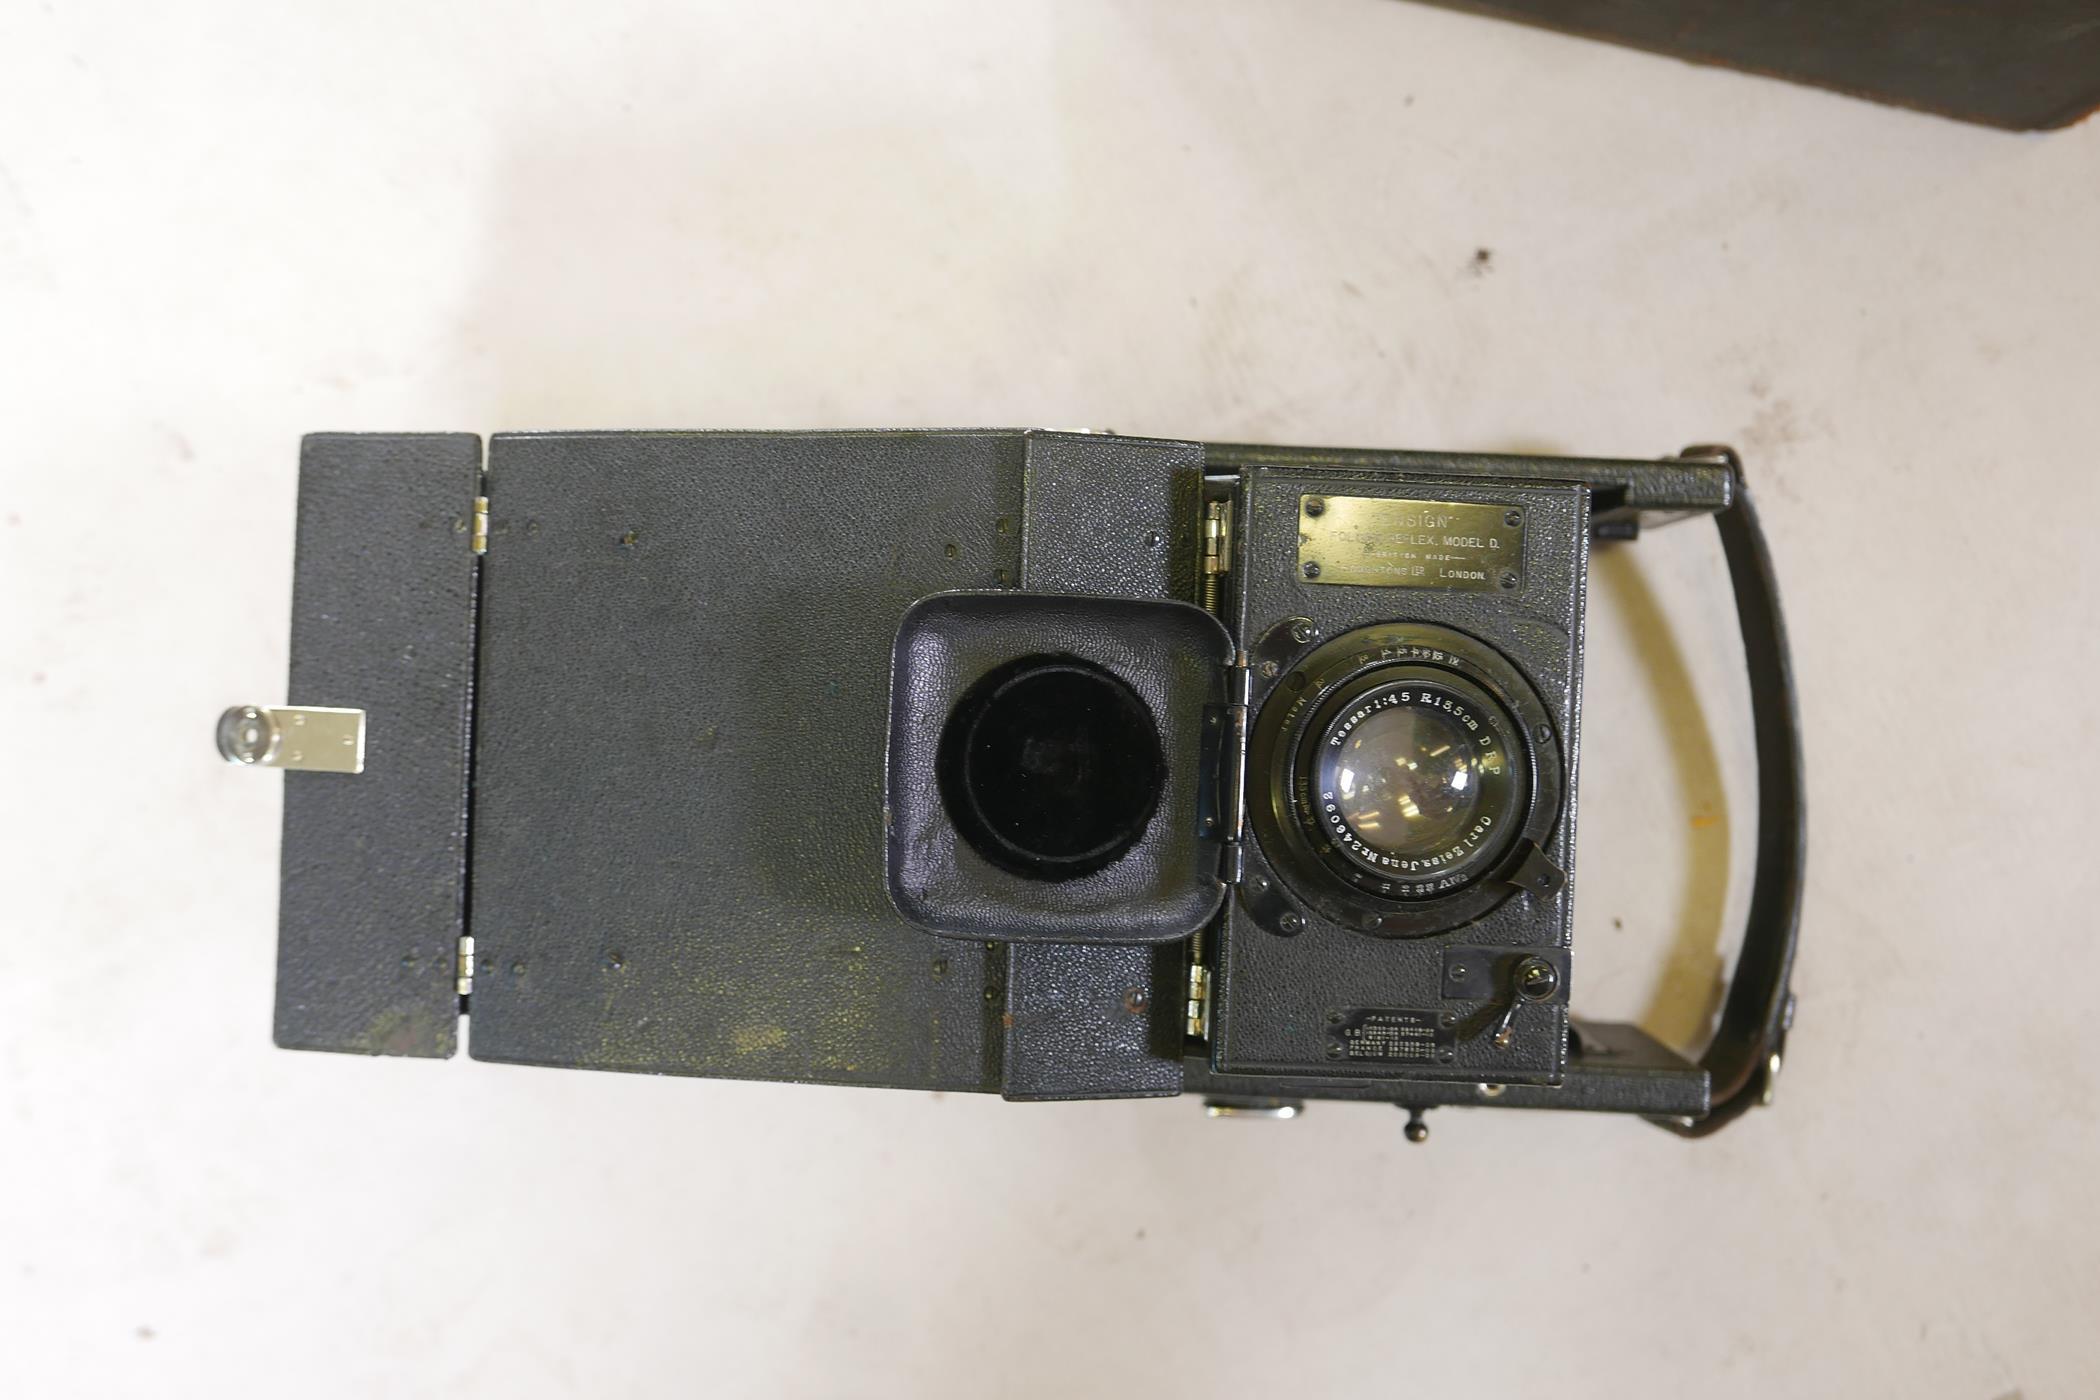 A quantity of antique photography equipment, Engsign Klito, Kodak Duaflex, No2 Hawkeye Model B, - Image 9 of 12